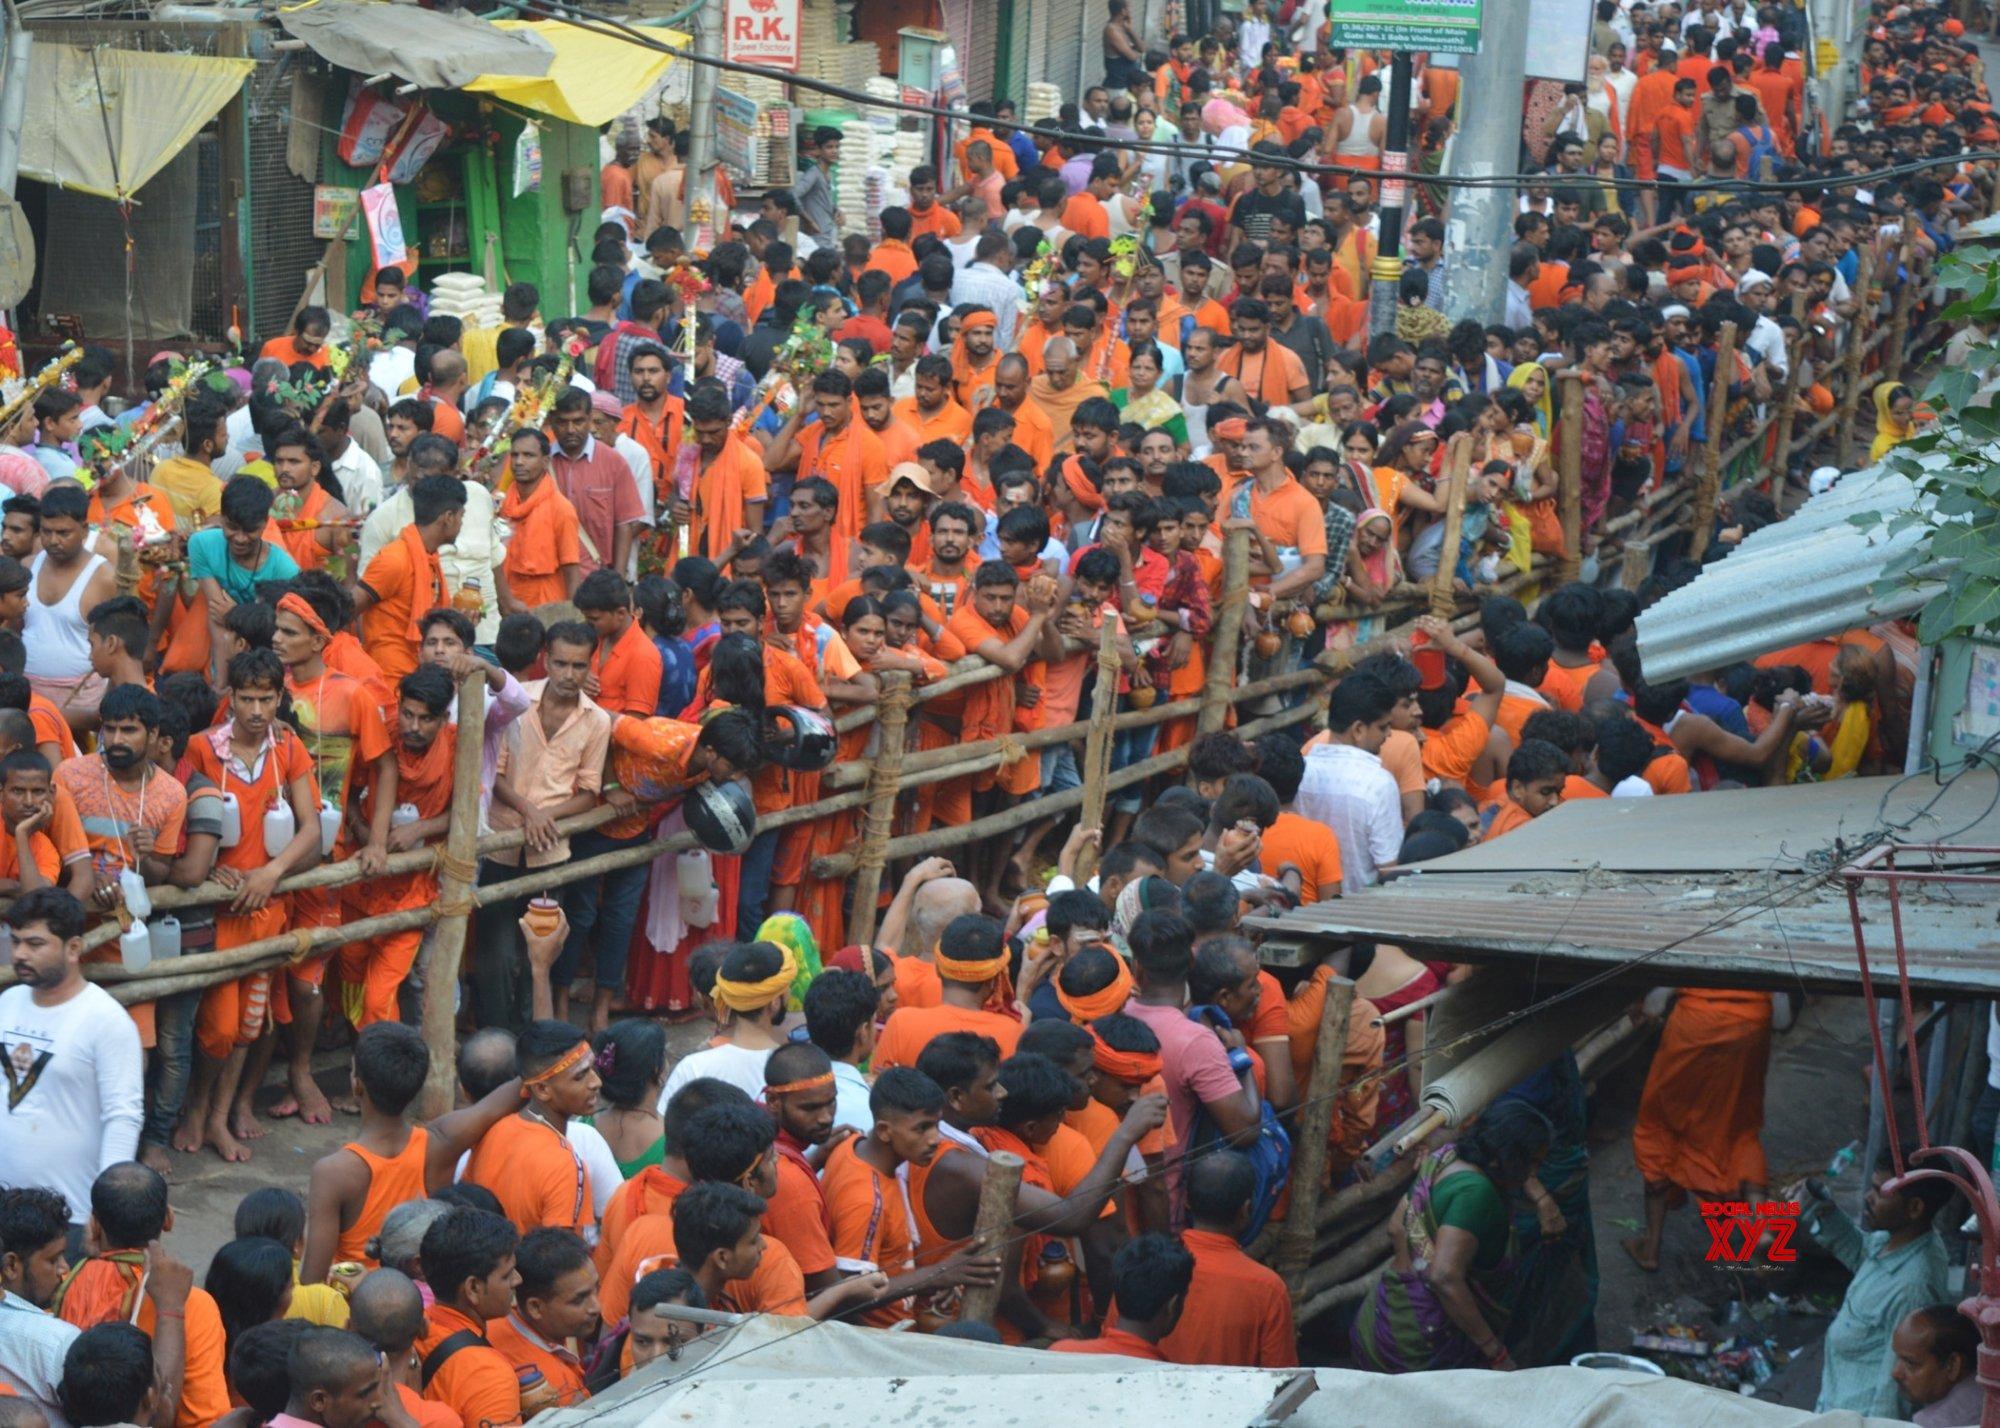 Varanasi: First Monday of 'Sawan' - Kanvariyas throng Kashi